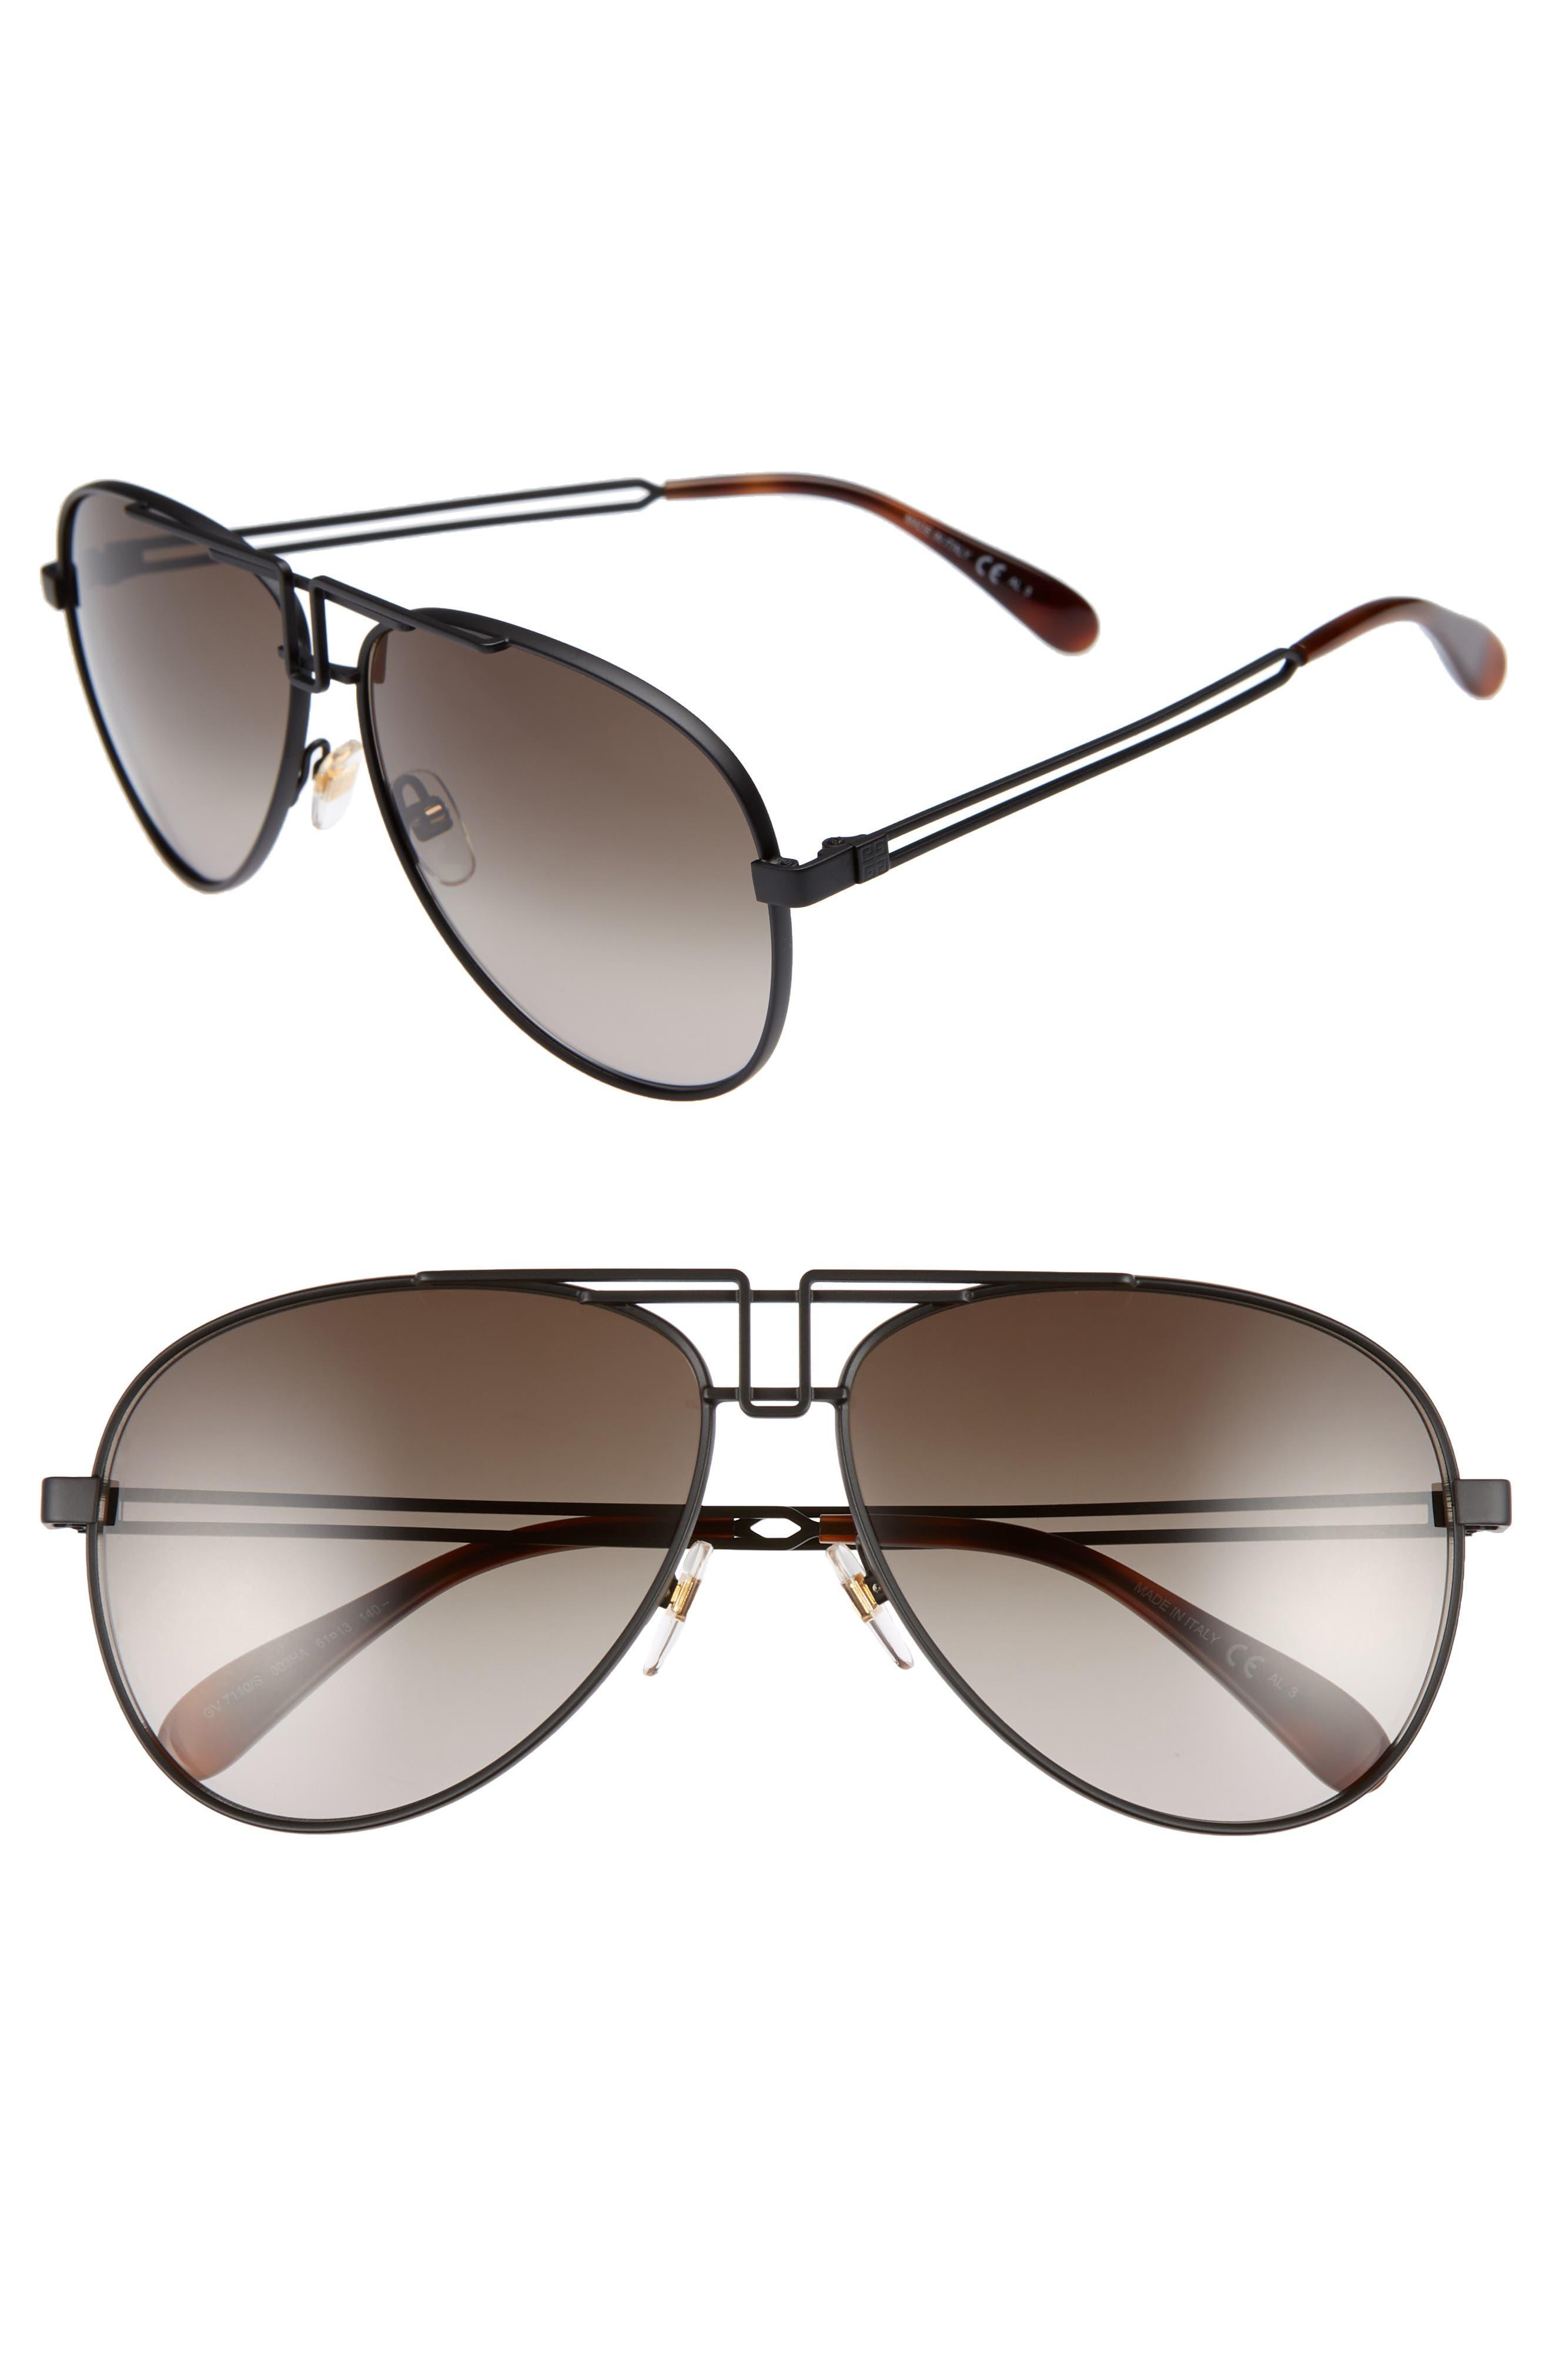 61mm Aviator Sunglasses,                             Main thumbnail 1, color,                             MATTE BLACK